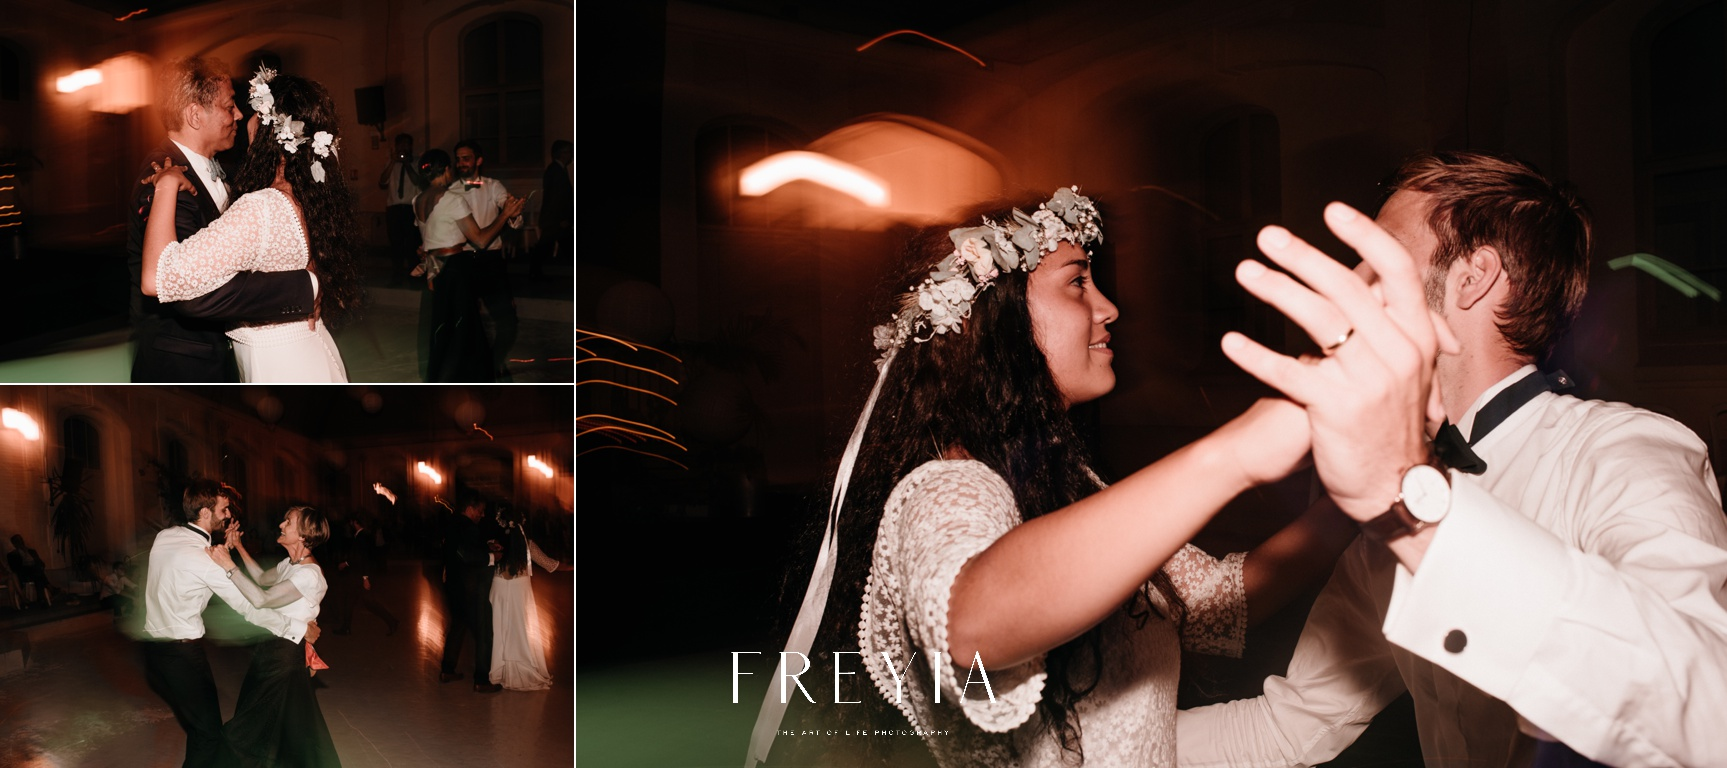 R + T |  mariage reportage alternatif moody intime minimaliste vintage naturel boho boheme |  PHOTOGRAPHE mariage PARIS france destination  | FREYIA photography_-374.jpg